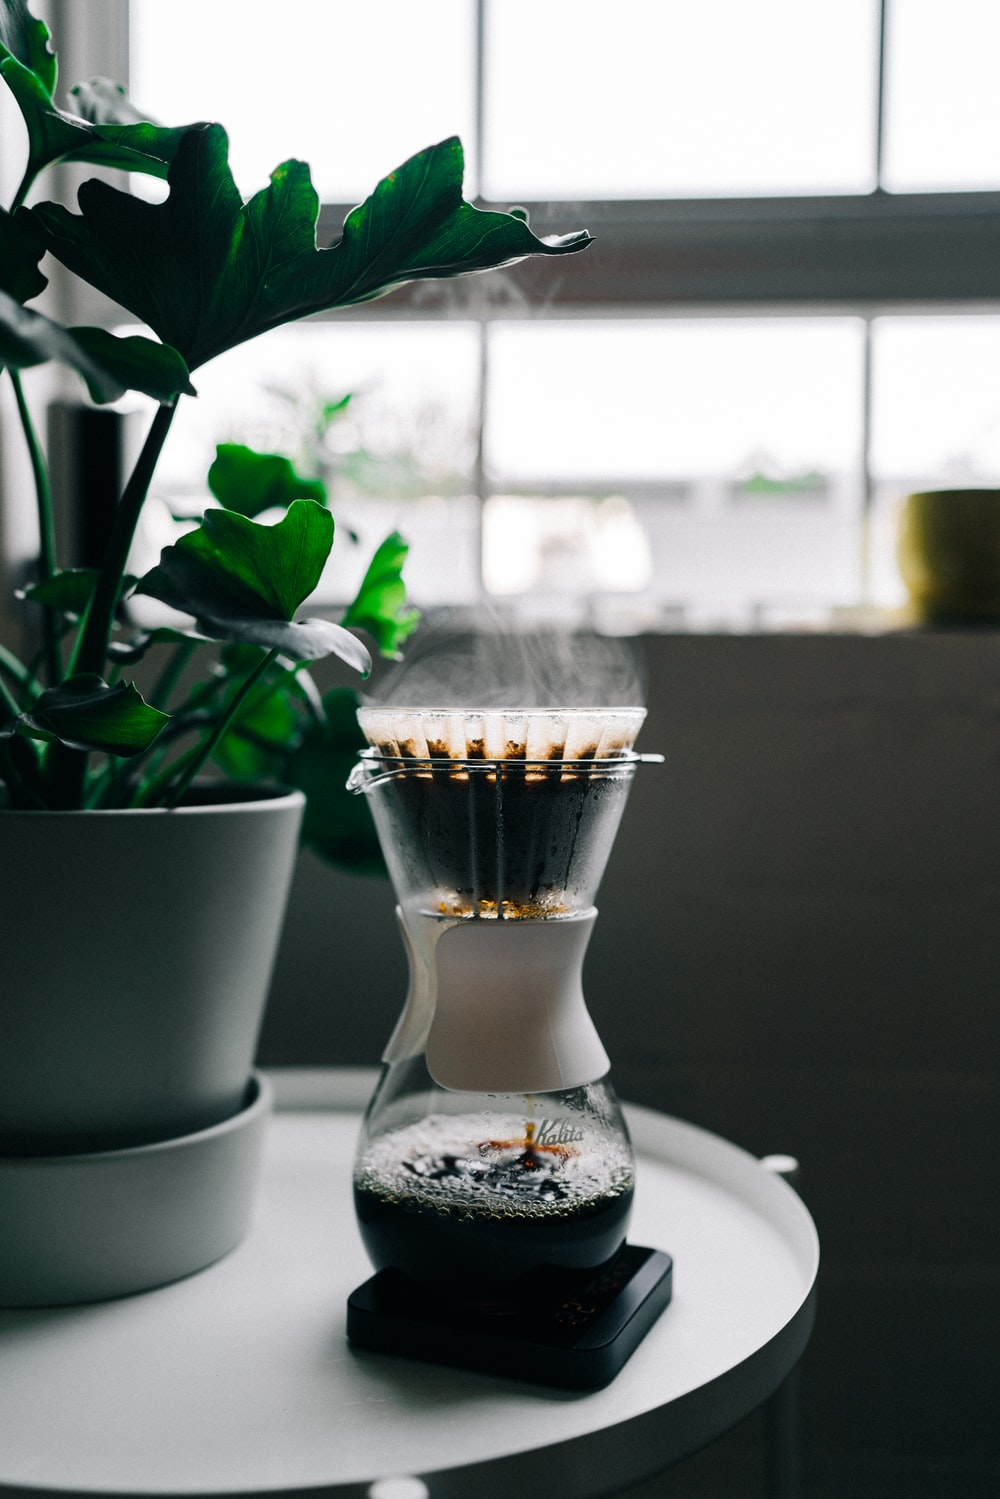 turned on black and grey coffeemaker near green leaf plant